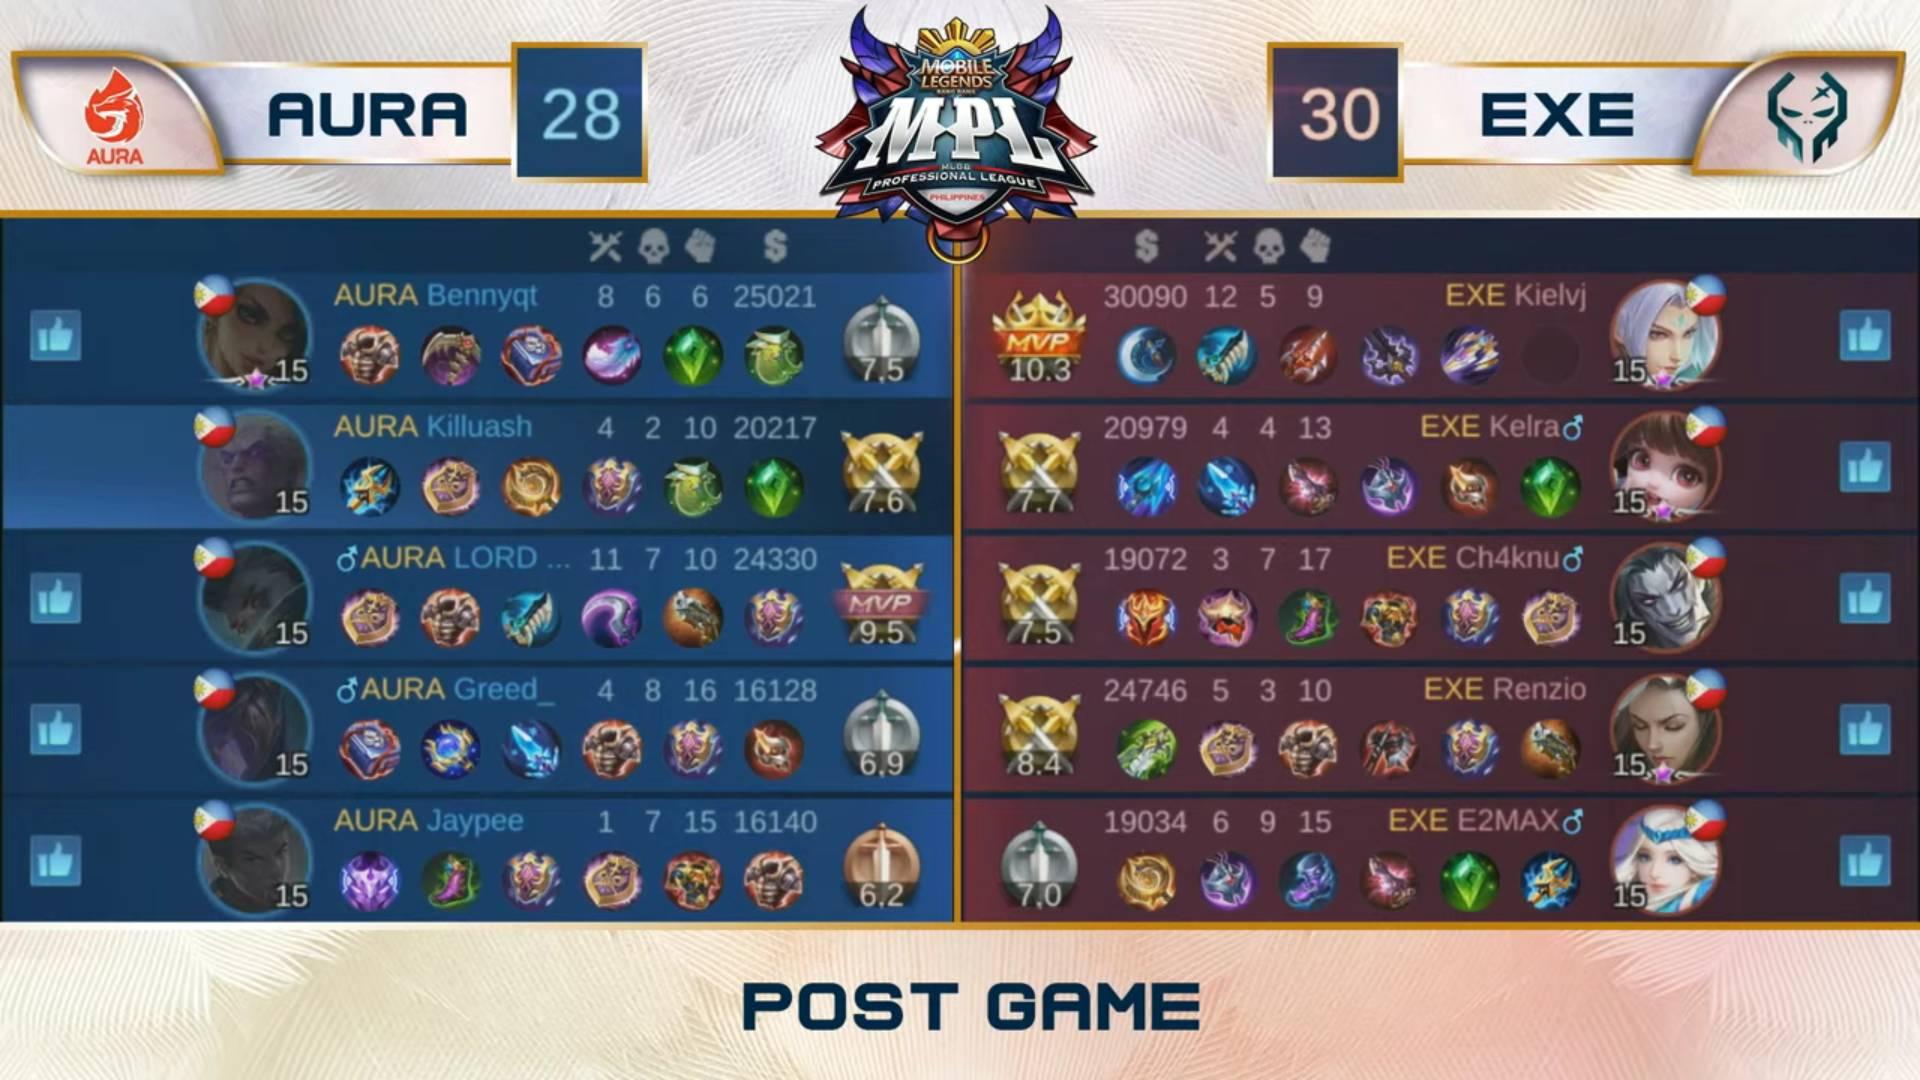 MPL-PH-Season-7-semis-Execration-def-Aura-PH-Game-2 Kielvj gets back at Aura PH as Execration ends MPL PH Finals drought ESports Mobile Legends MPL-PH News  - philippine sports news